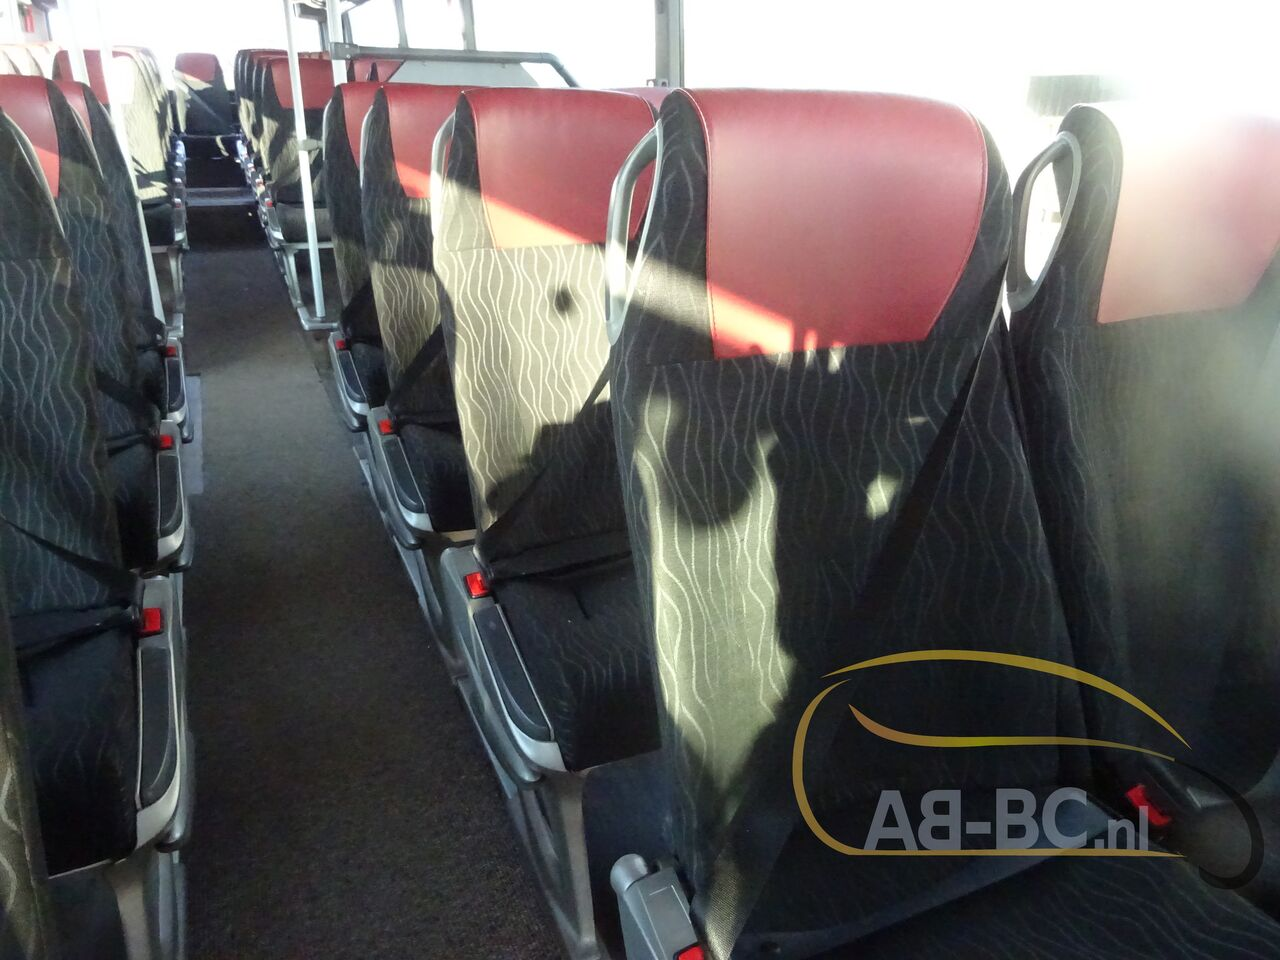 coach-bus-SETRA-S415H-52-Seats-EURO-6-Liftbus---1630913409408294905_big_a99816bcc50b462a16a53ab871aae622--21070517141280735500